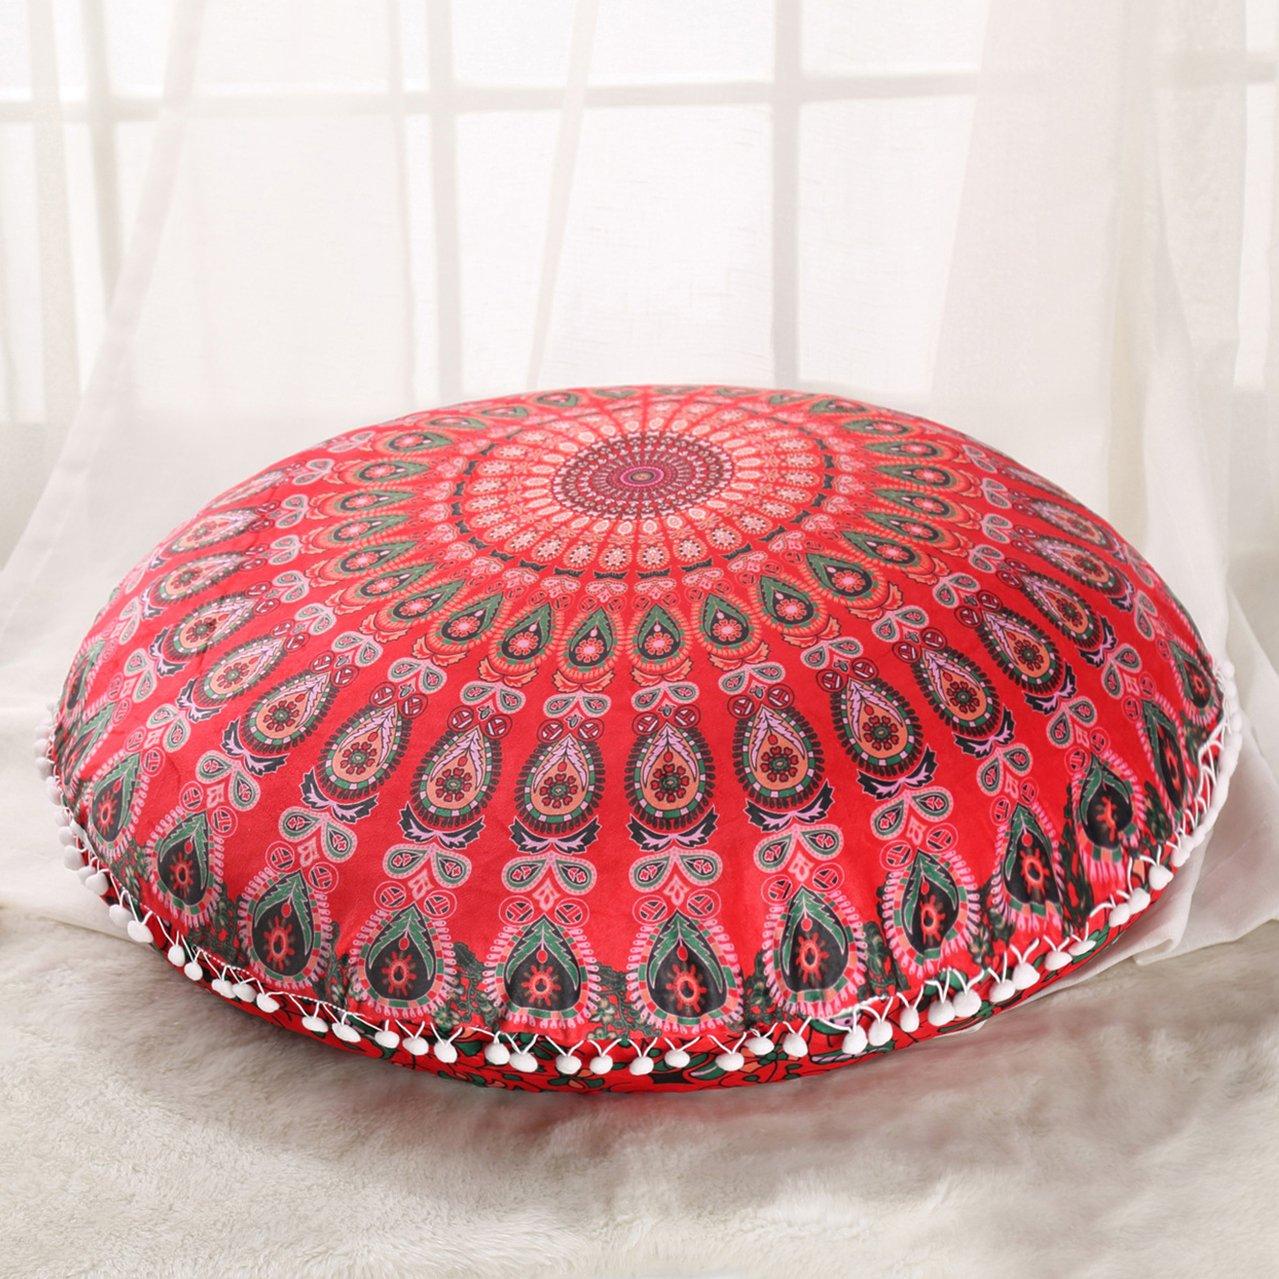 Sleepwish Large 30'' Round Pillow Cover Boho Mandala Floor Cushion Zen Meditation Pillow Case Outdoor Pom Pom Pillow Sham (Girly Red)